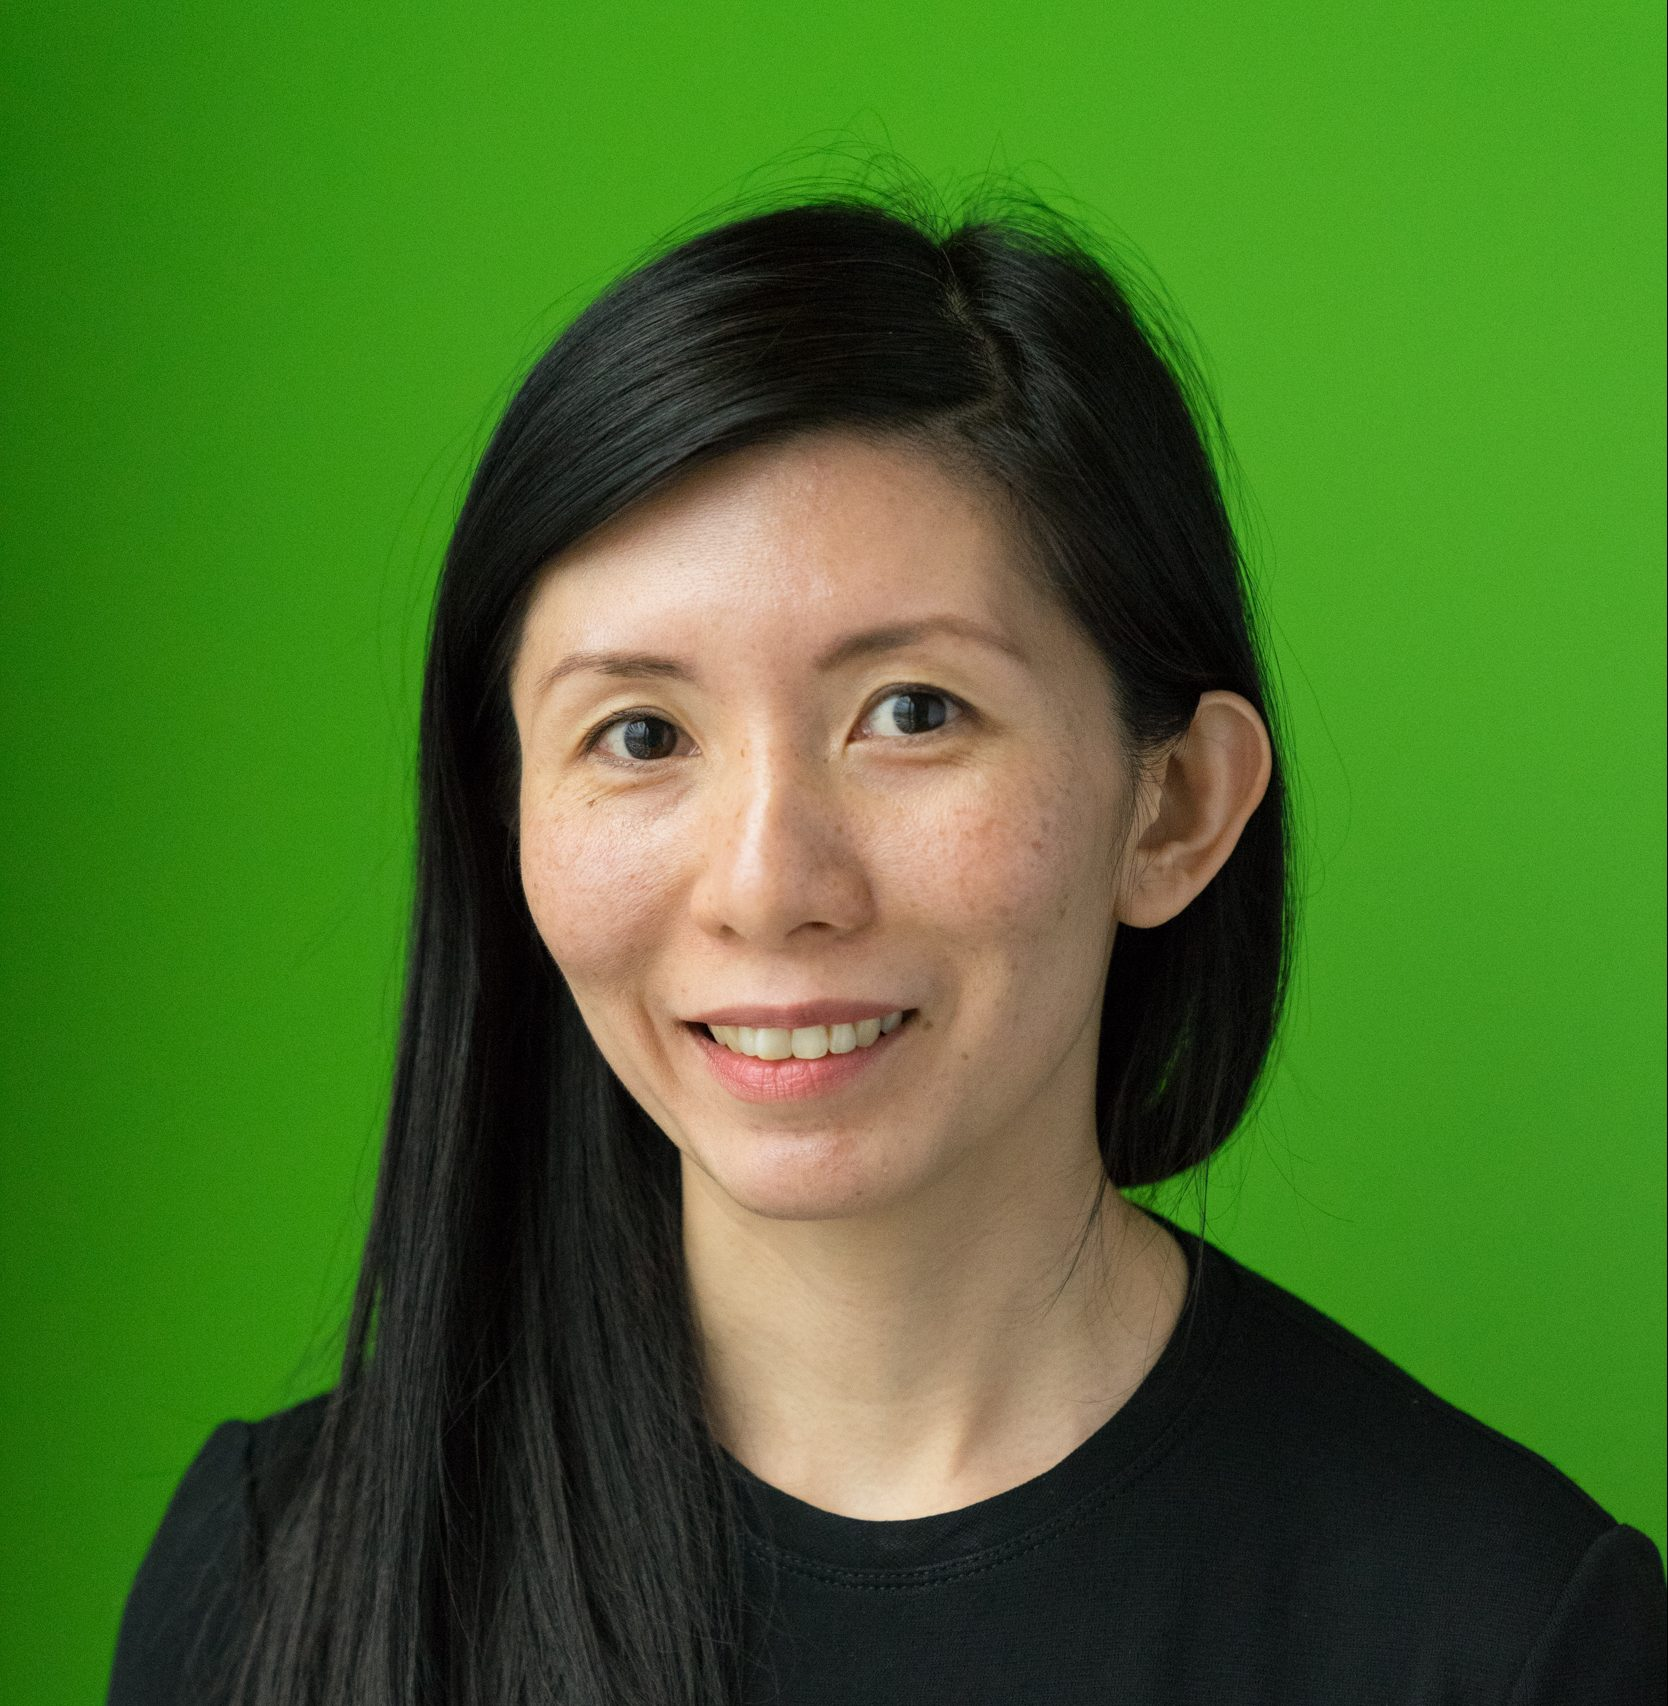 Jenn Mar